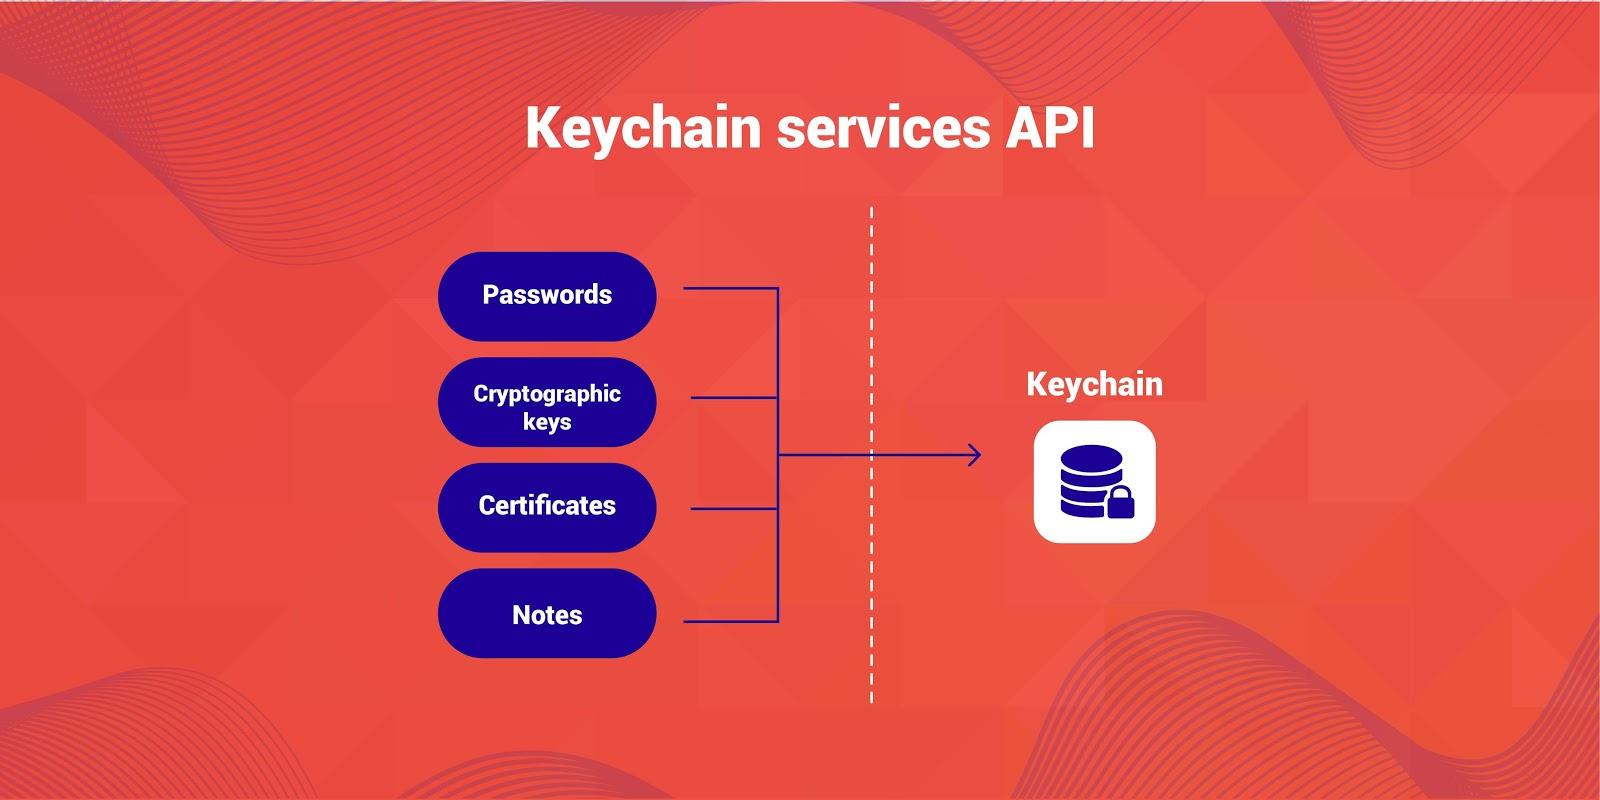 Keychain services API